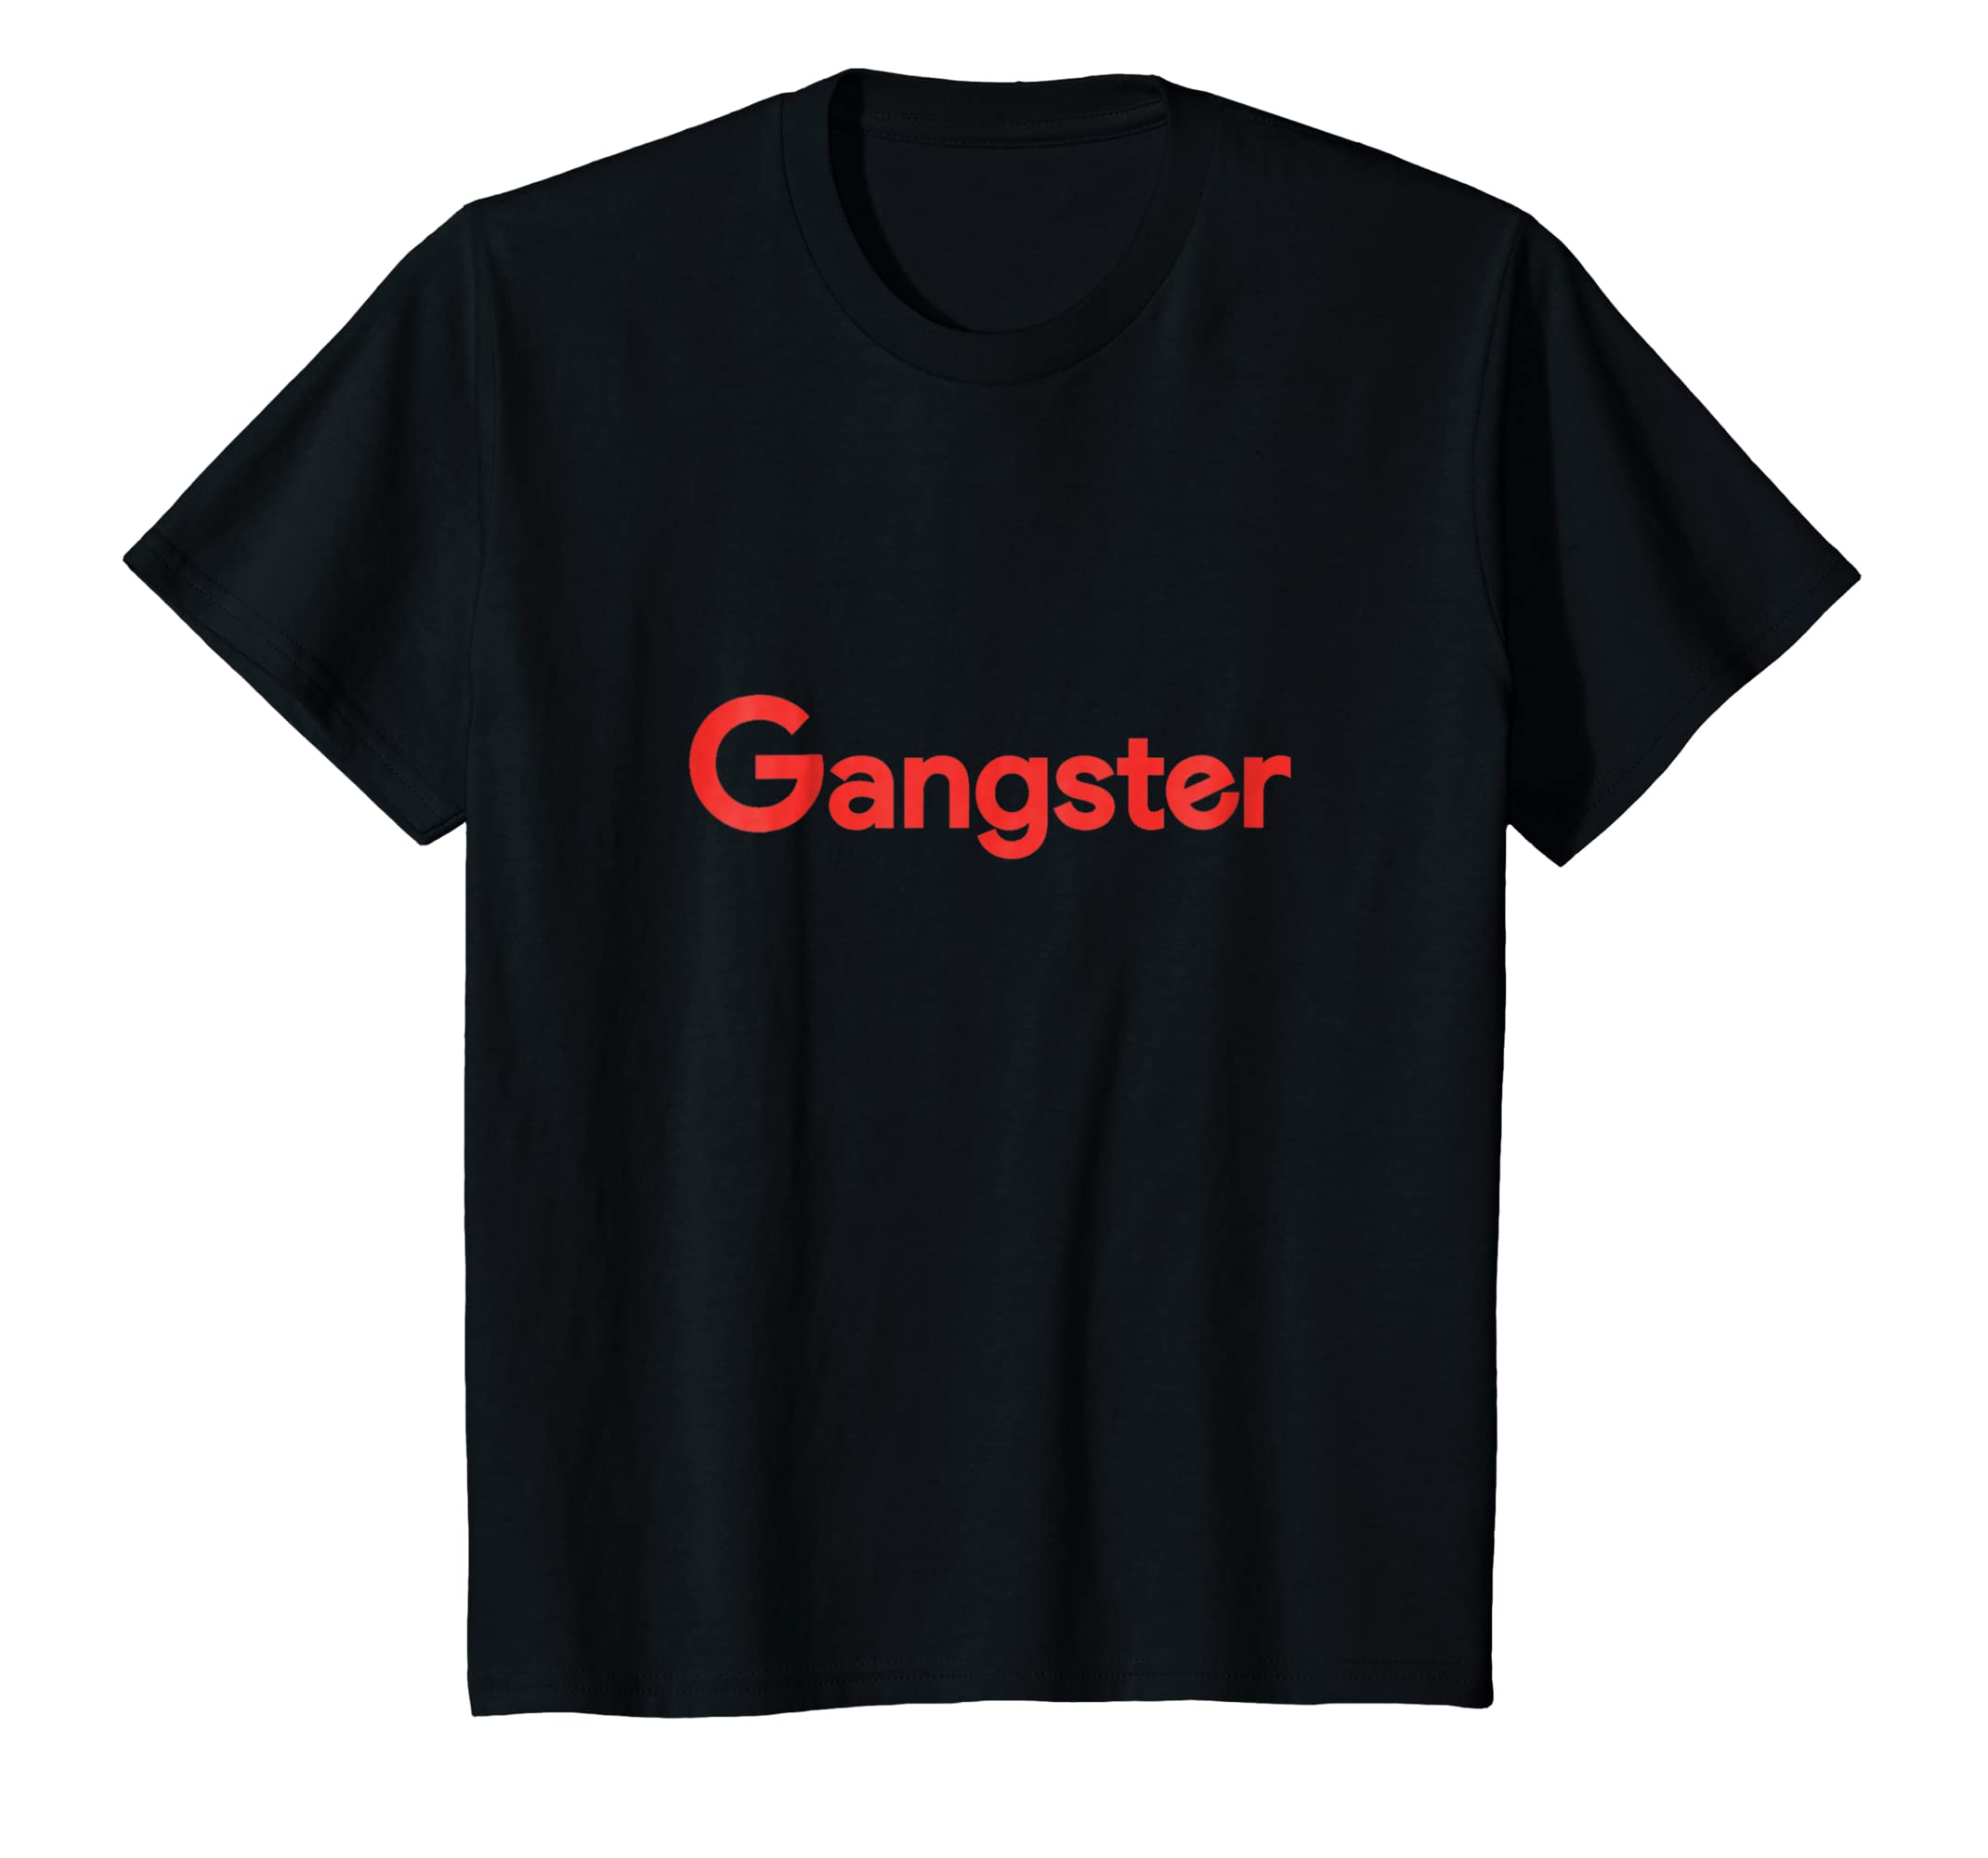 Gangster Shirt (Official)-Colonhue